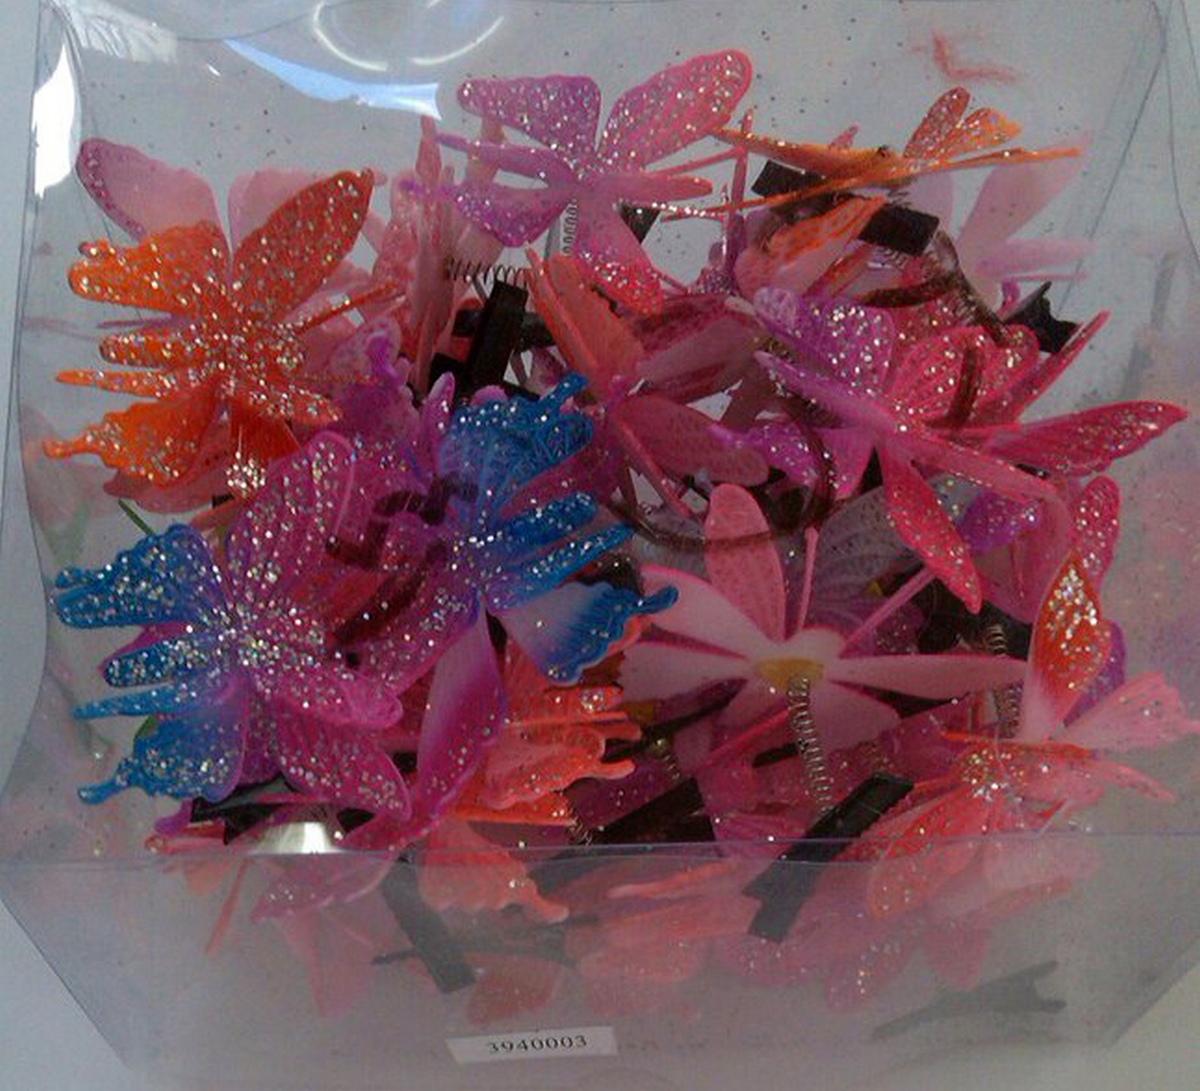 Зажим детский «Бабочка» 3940003